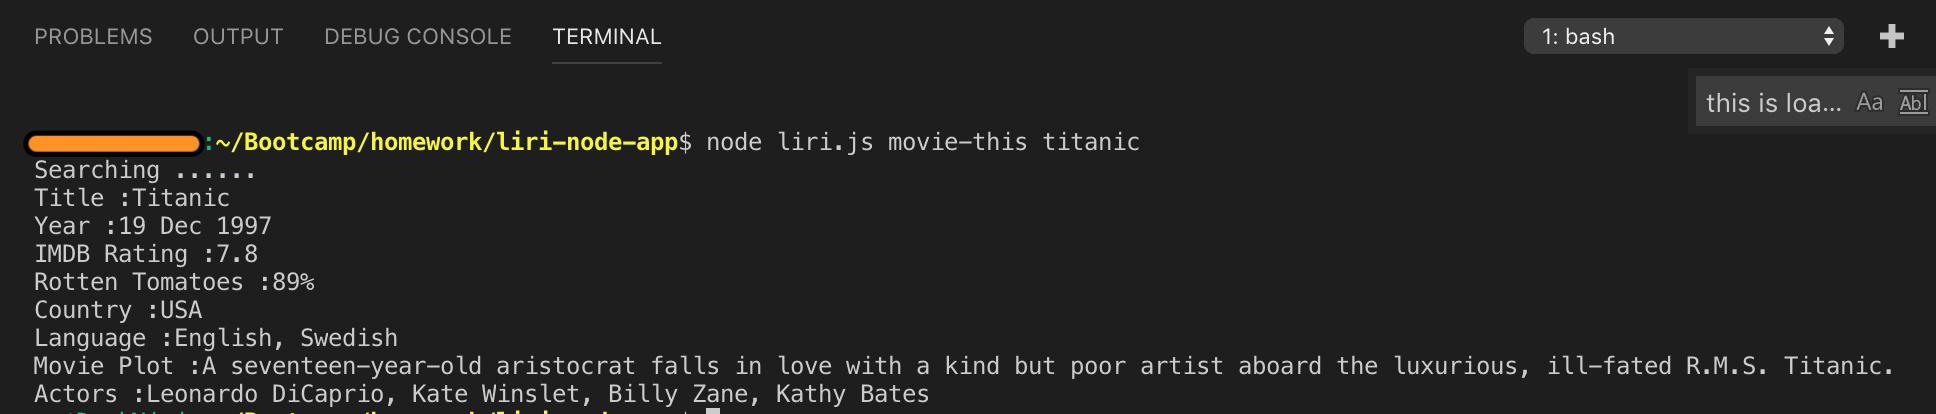 movie-this